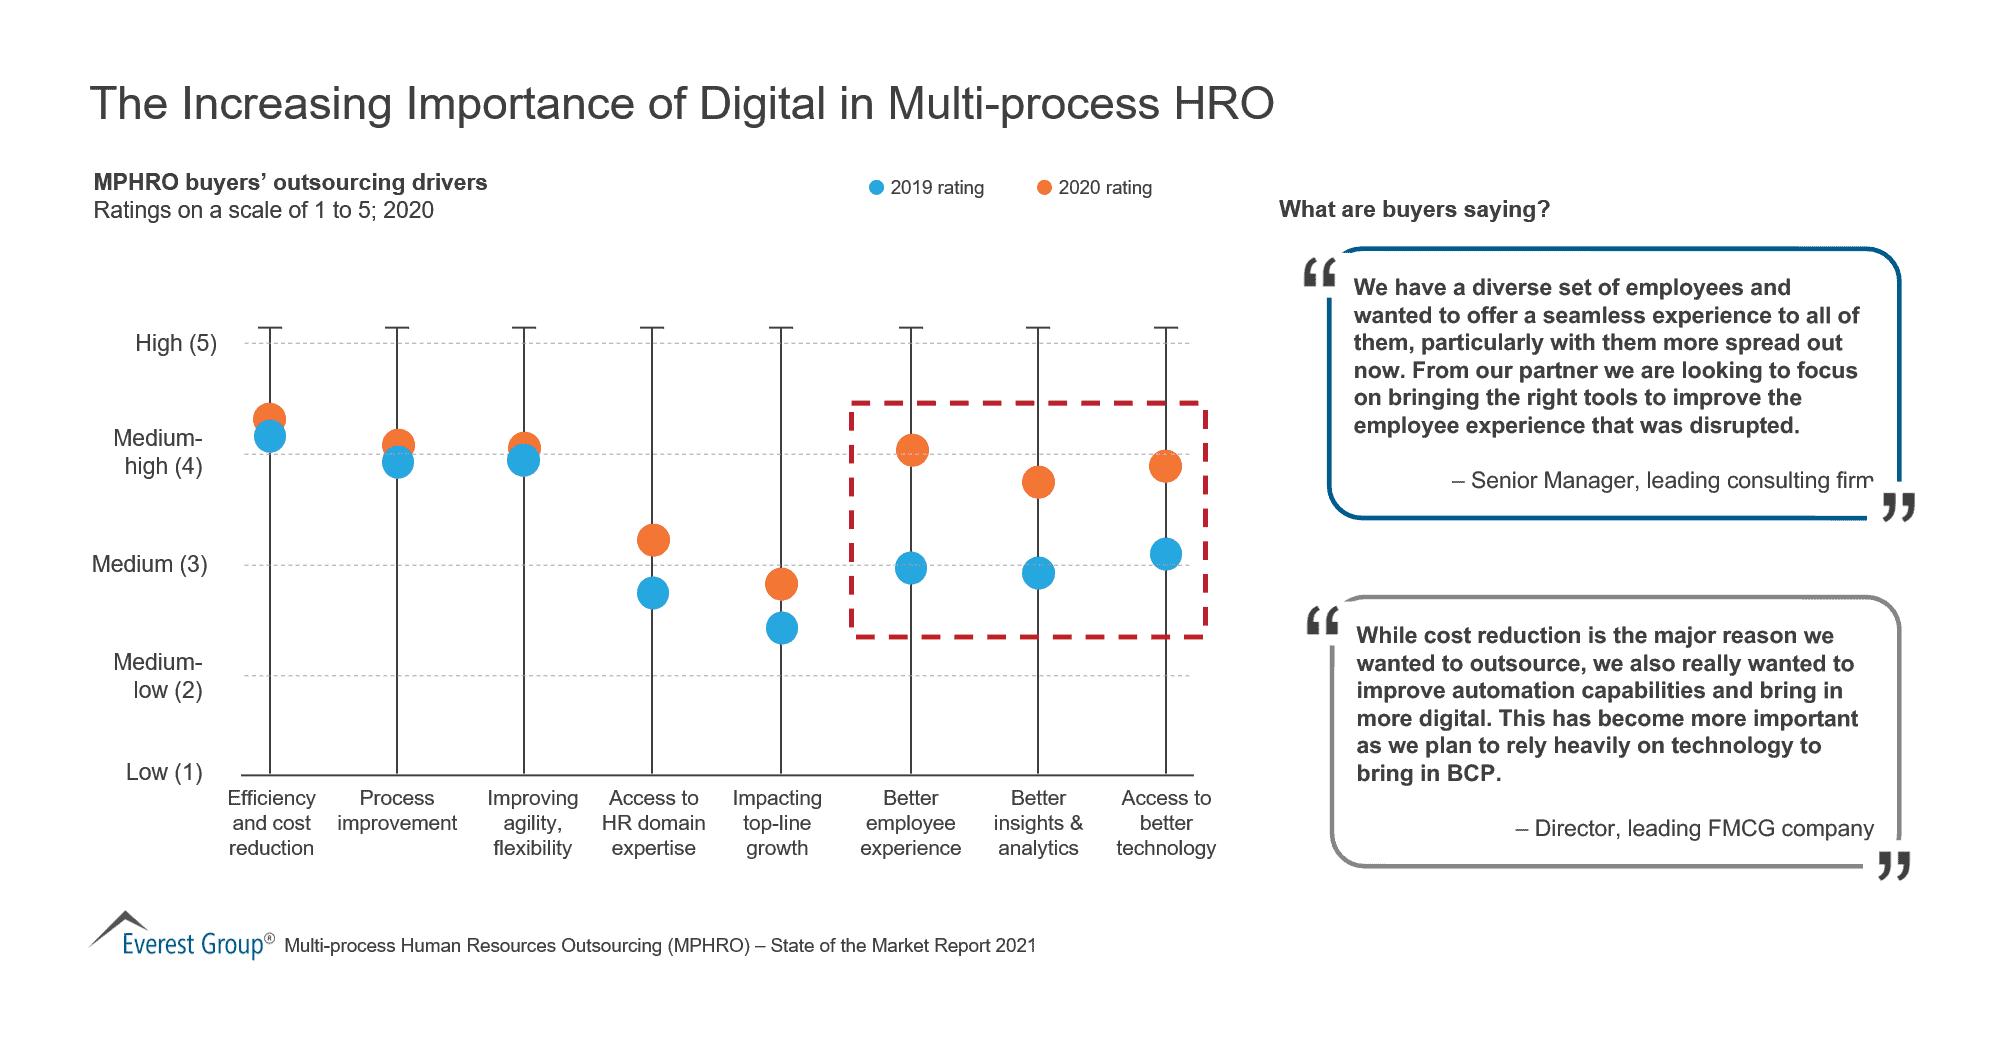 The Increasing Importance of Digital in Multi-process HRO